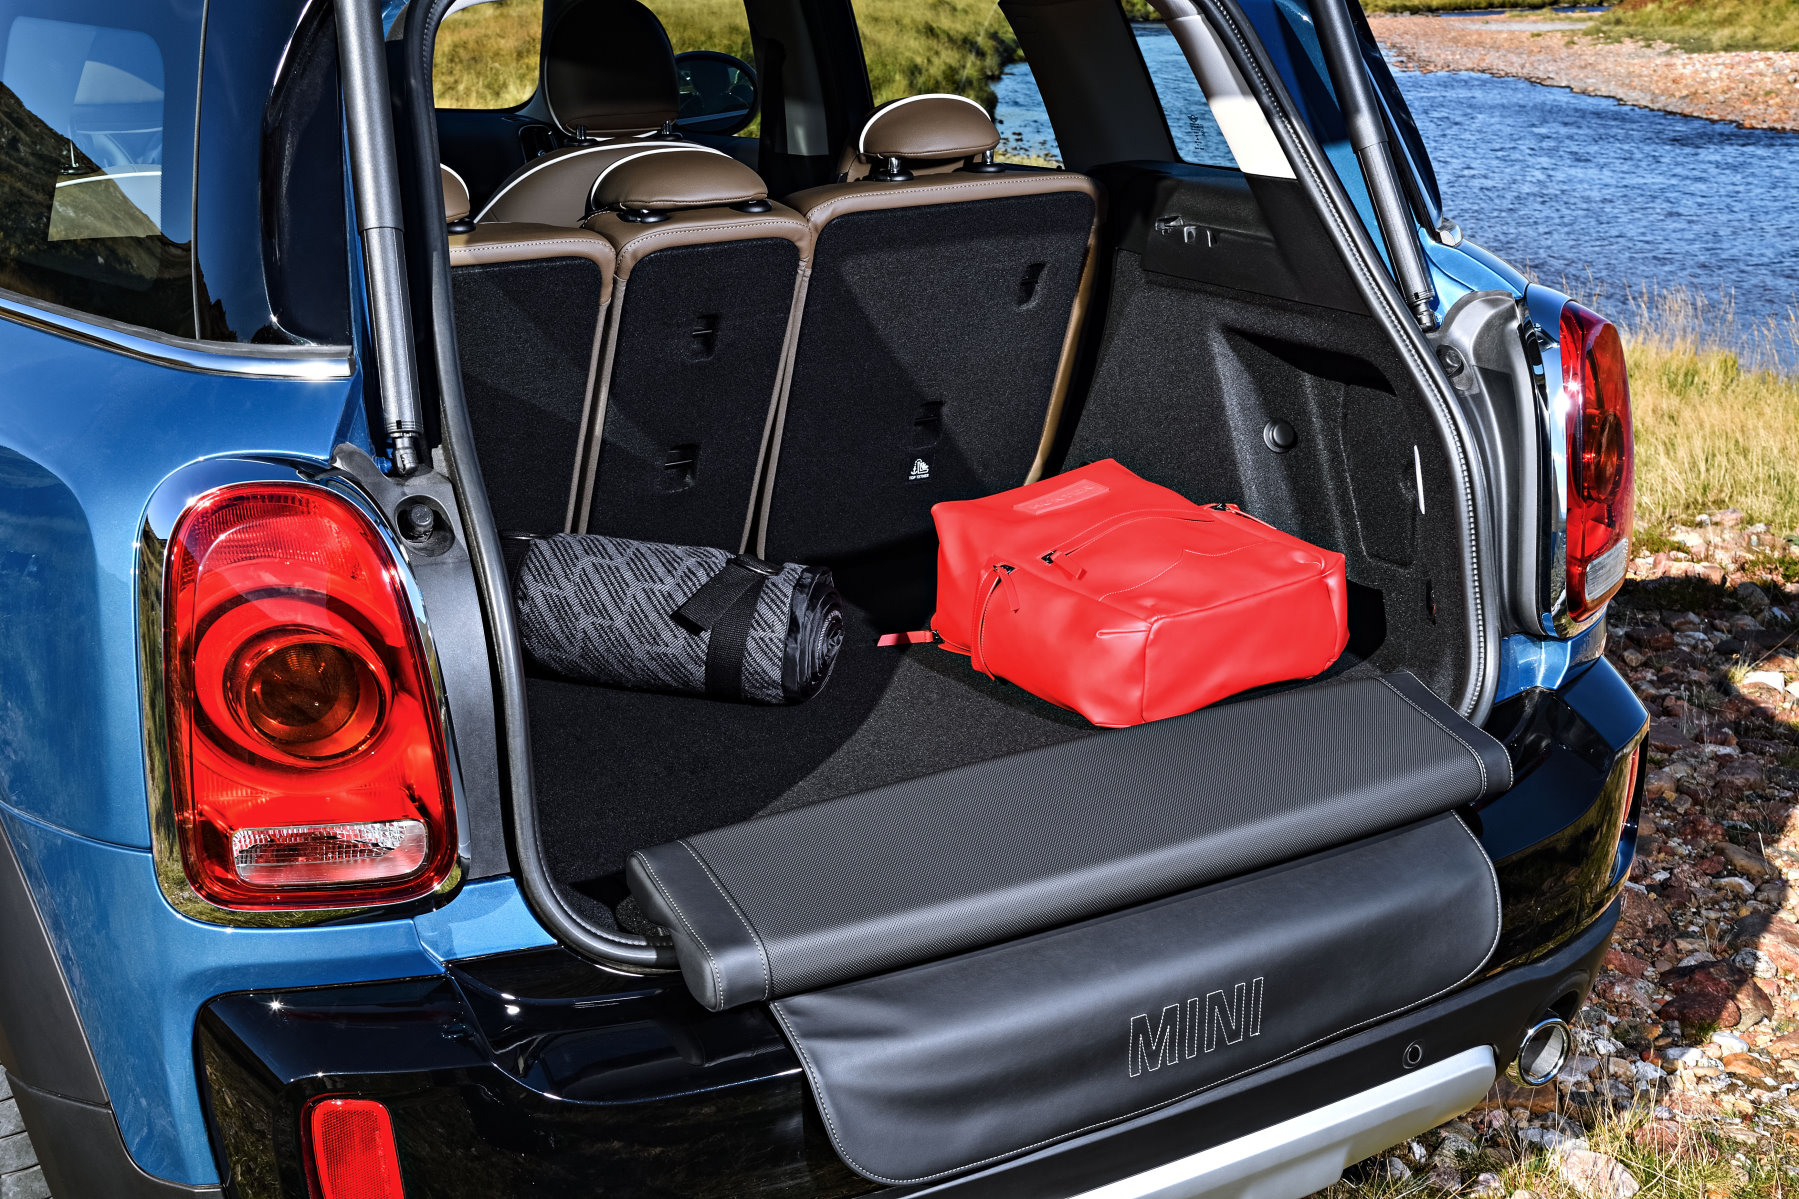 Tolle Mini Cooper S Schaltplan Bilder - Elektrische Schaltplan-Ideen ...